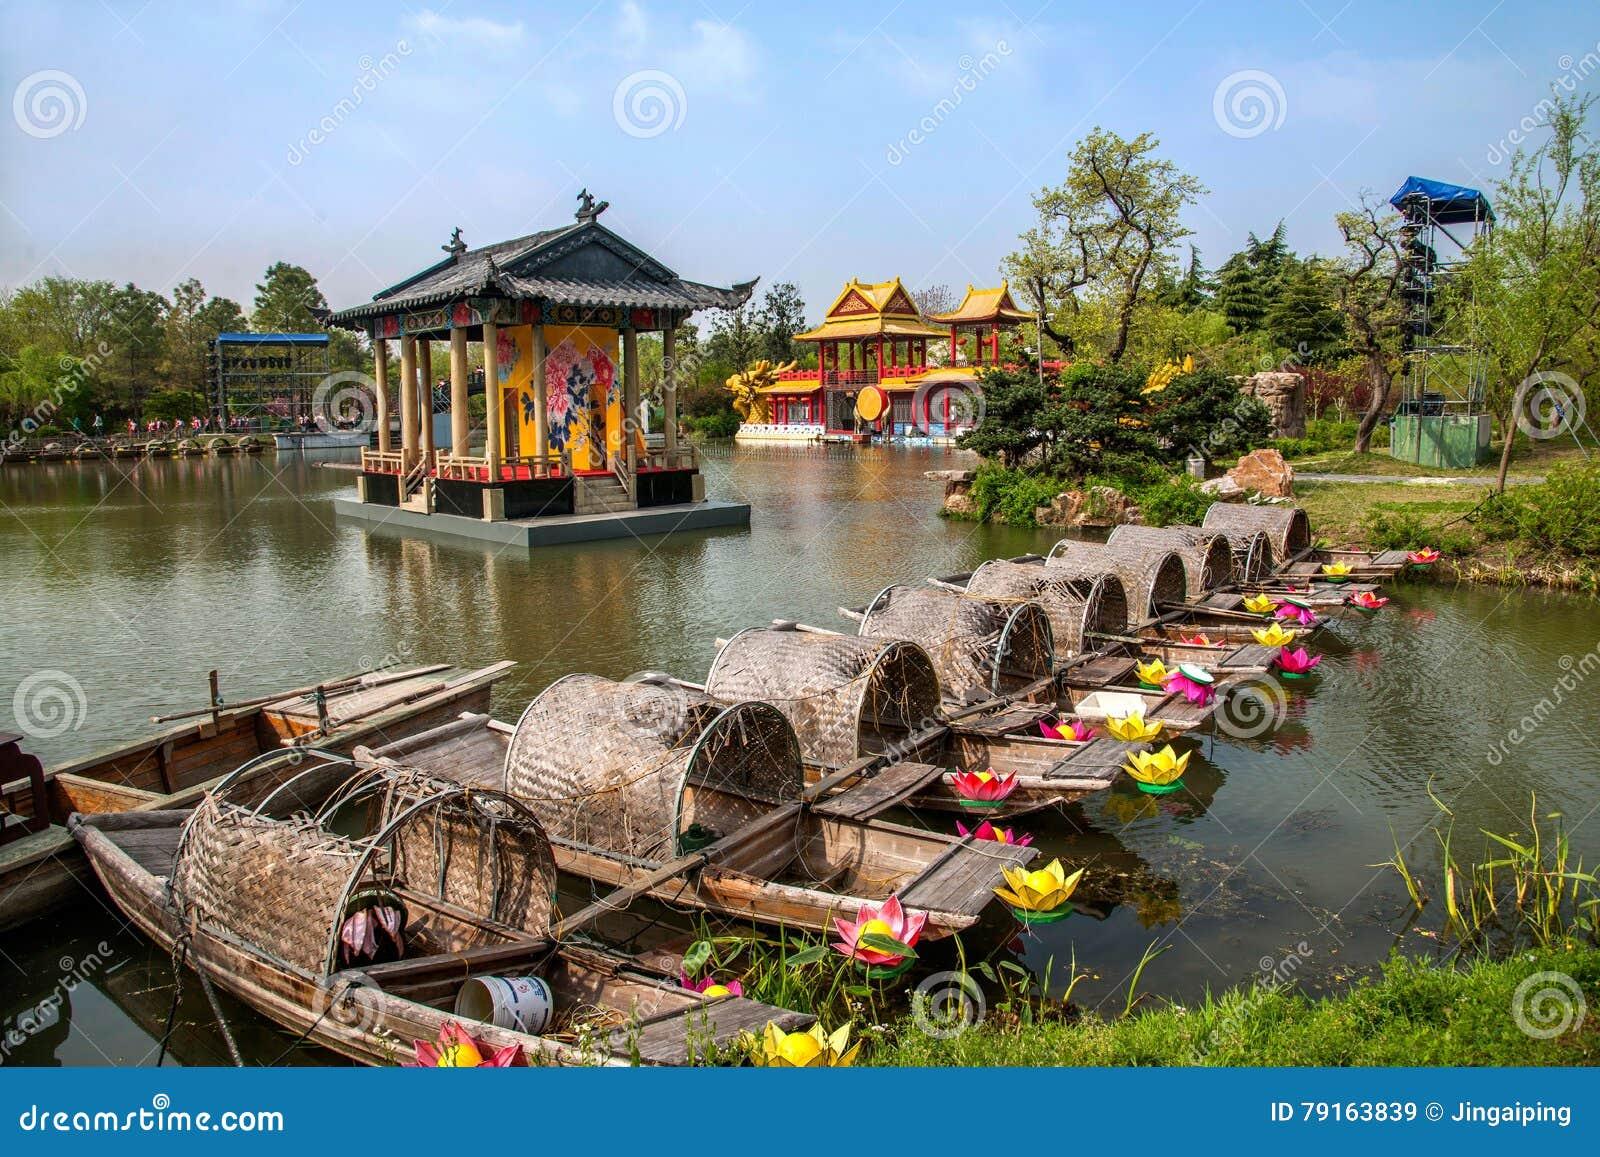 Yangzhou Slender West Lake Water Garden Stage Stock Image - Image of ...